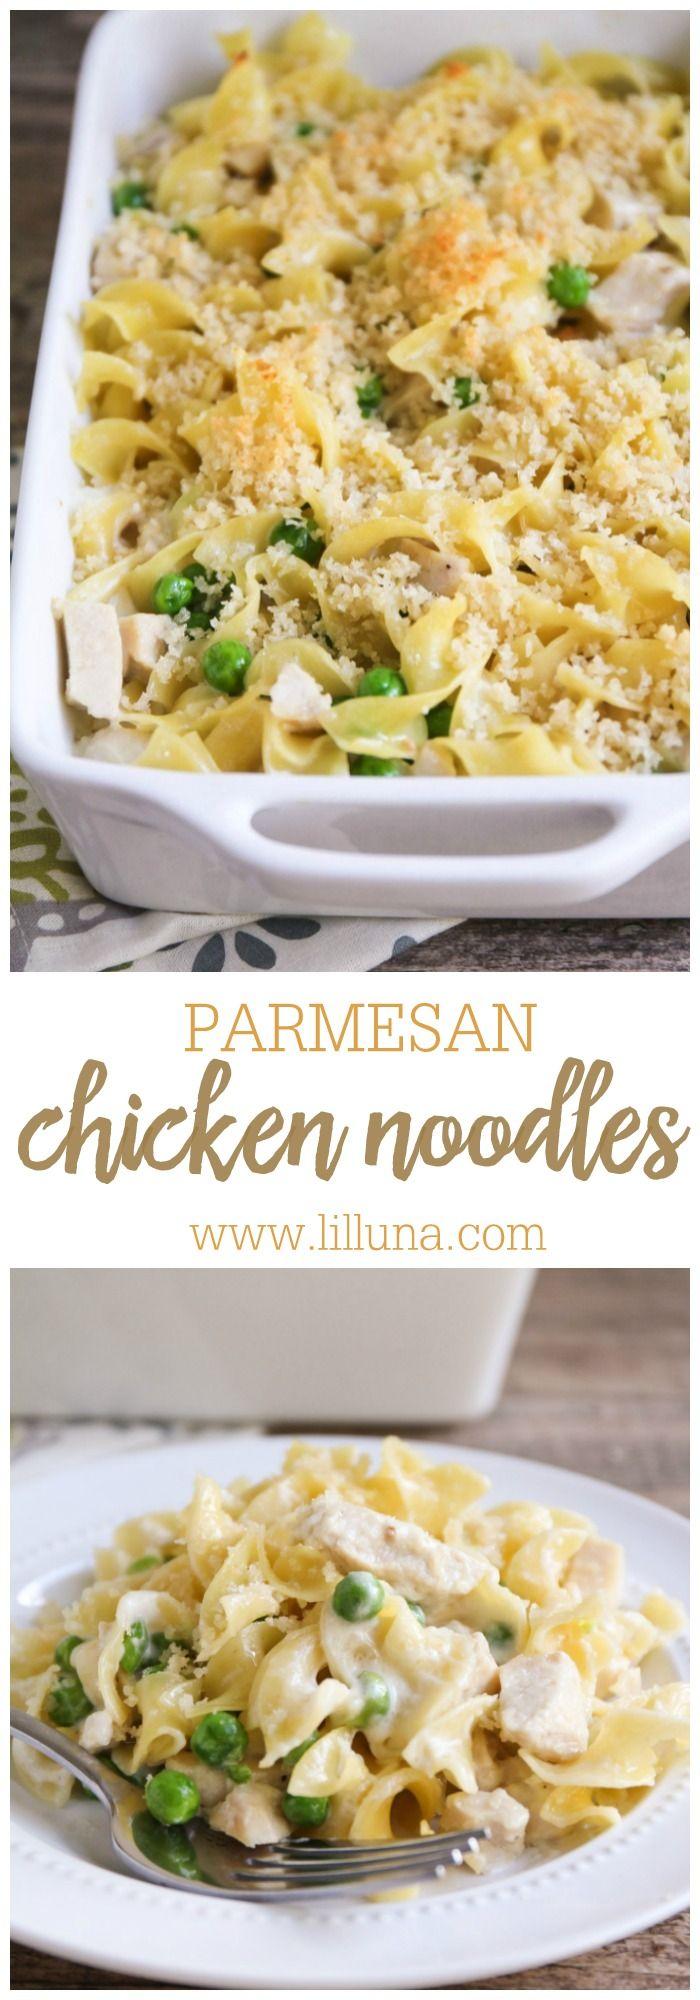 Garlic Parmesan Chicken and Noodles recipe { lilluna.com } So delicious and recipe includes egg noodles, peas, chicken, panko, and